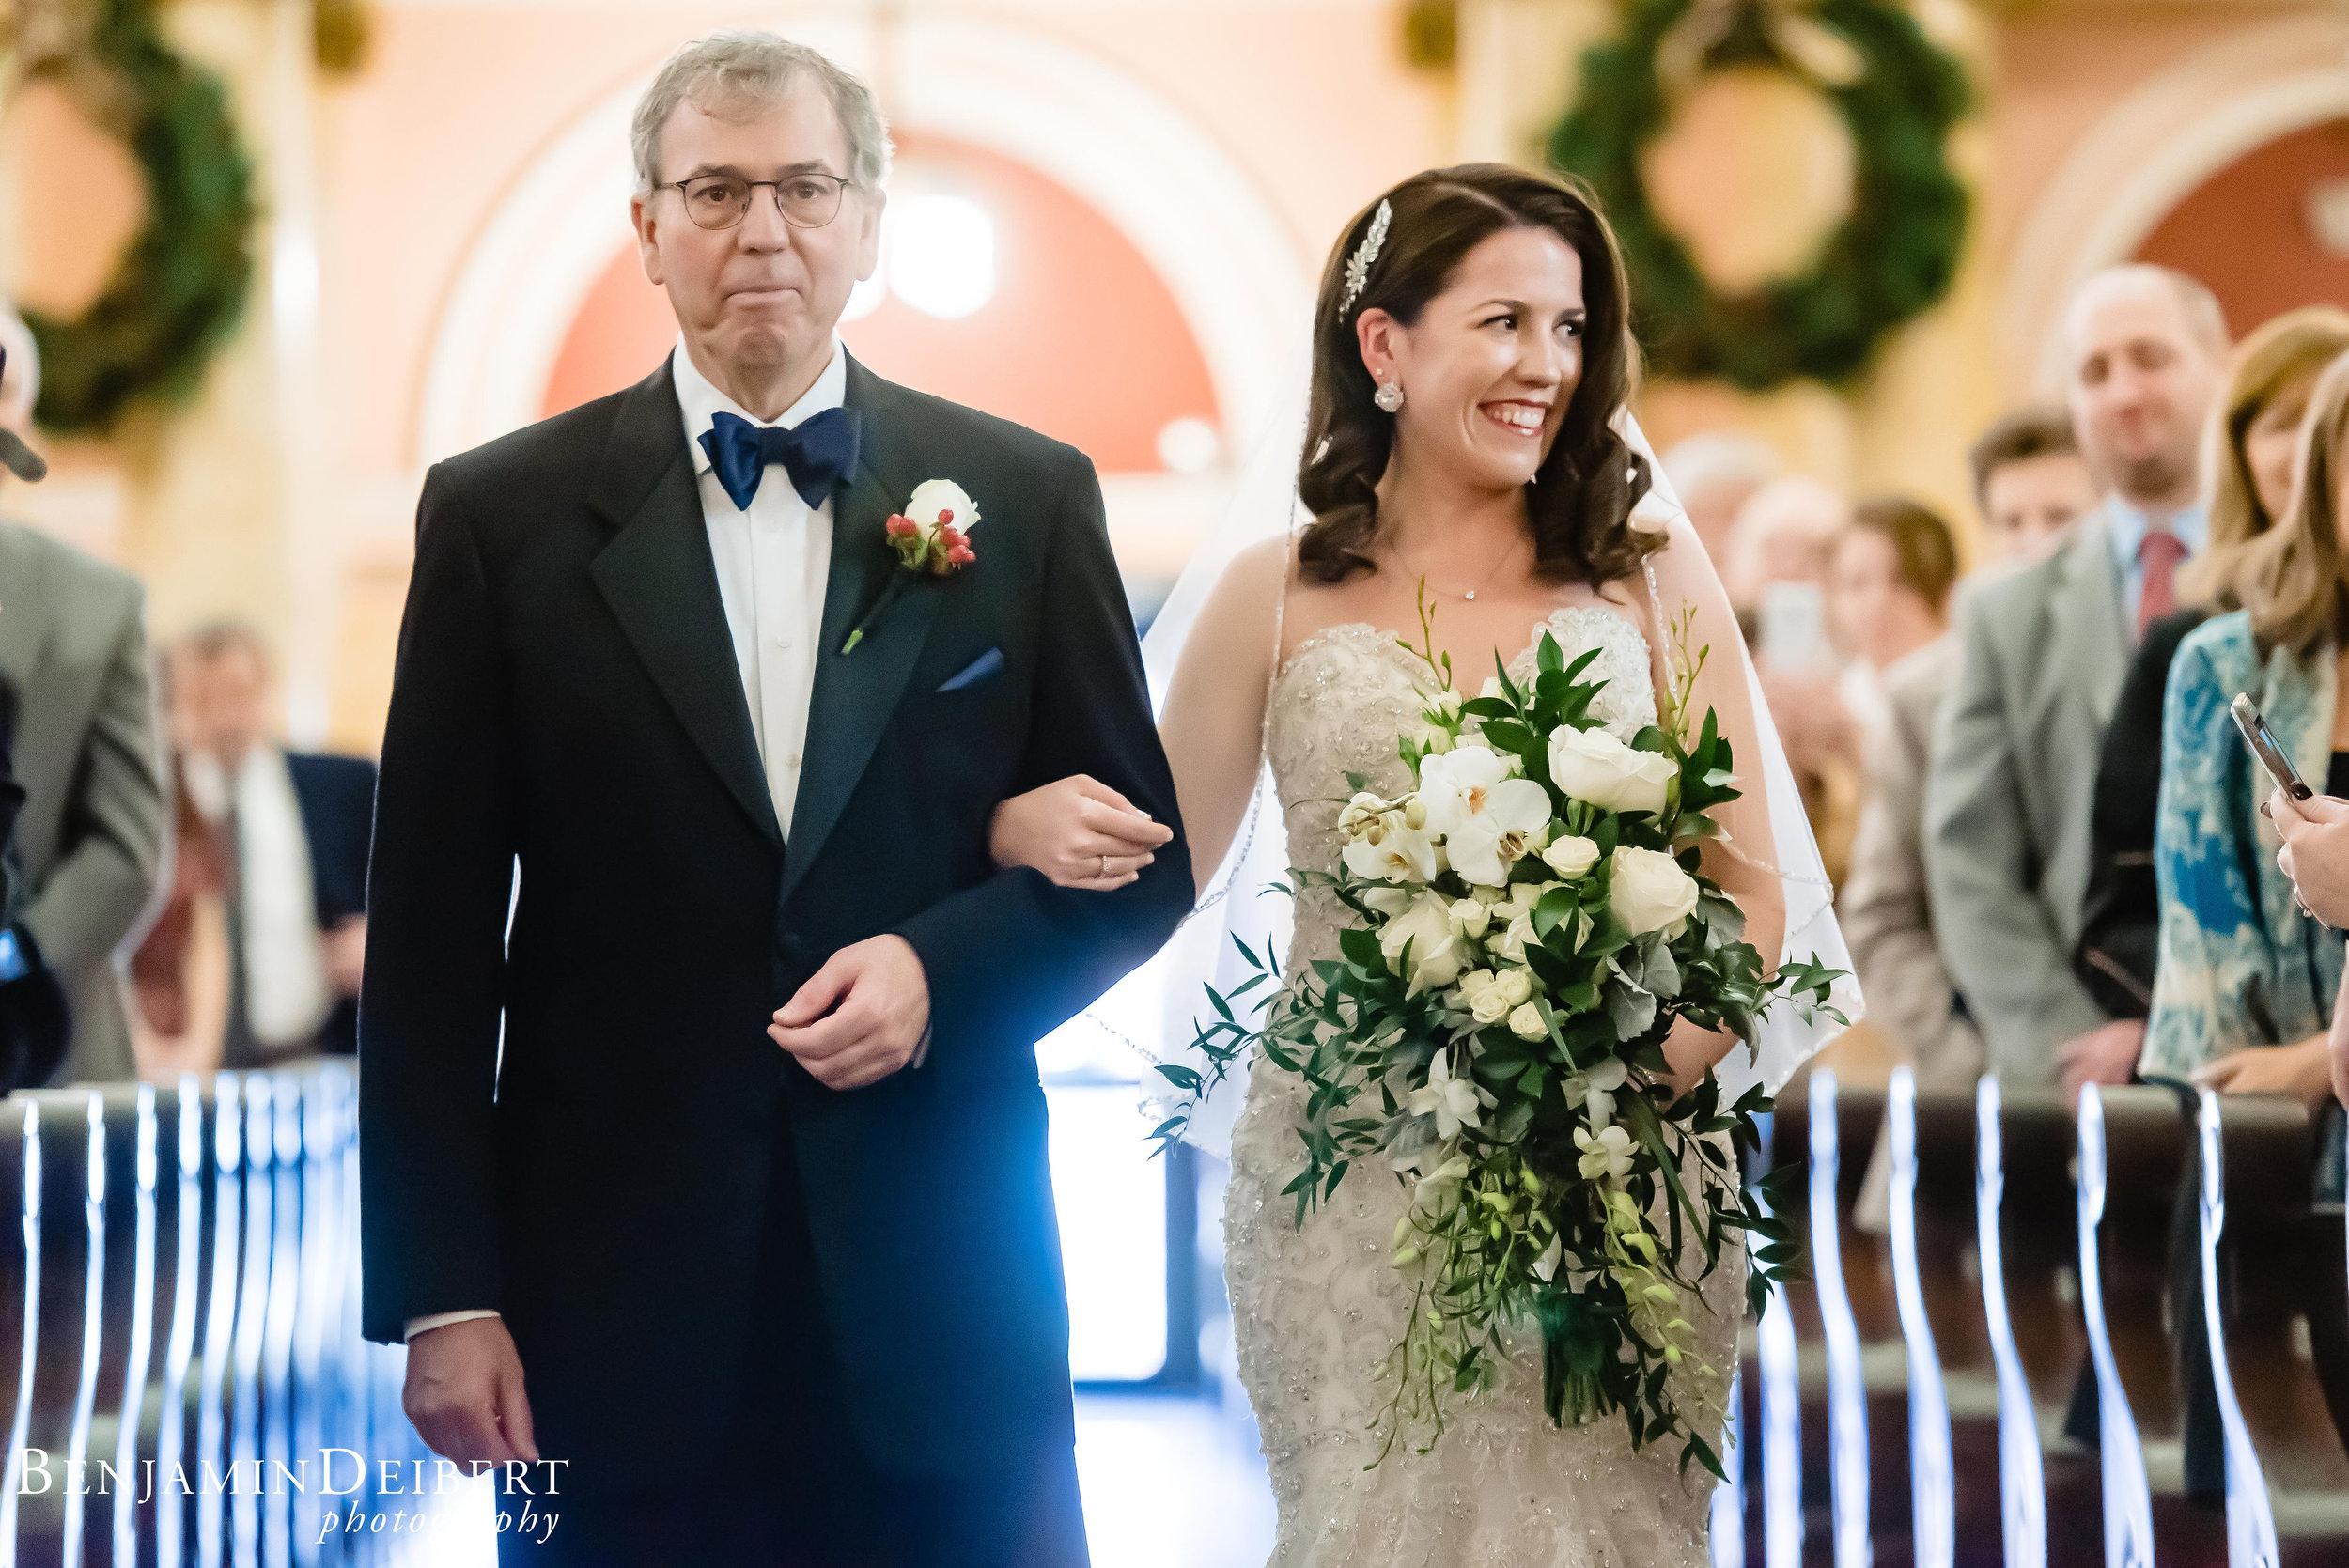 AlexandraandNicholas_RitzCarltonPhiladelphia_Wedding-32.jpg